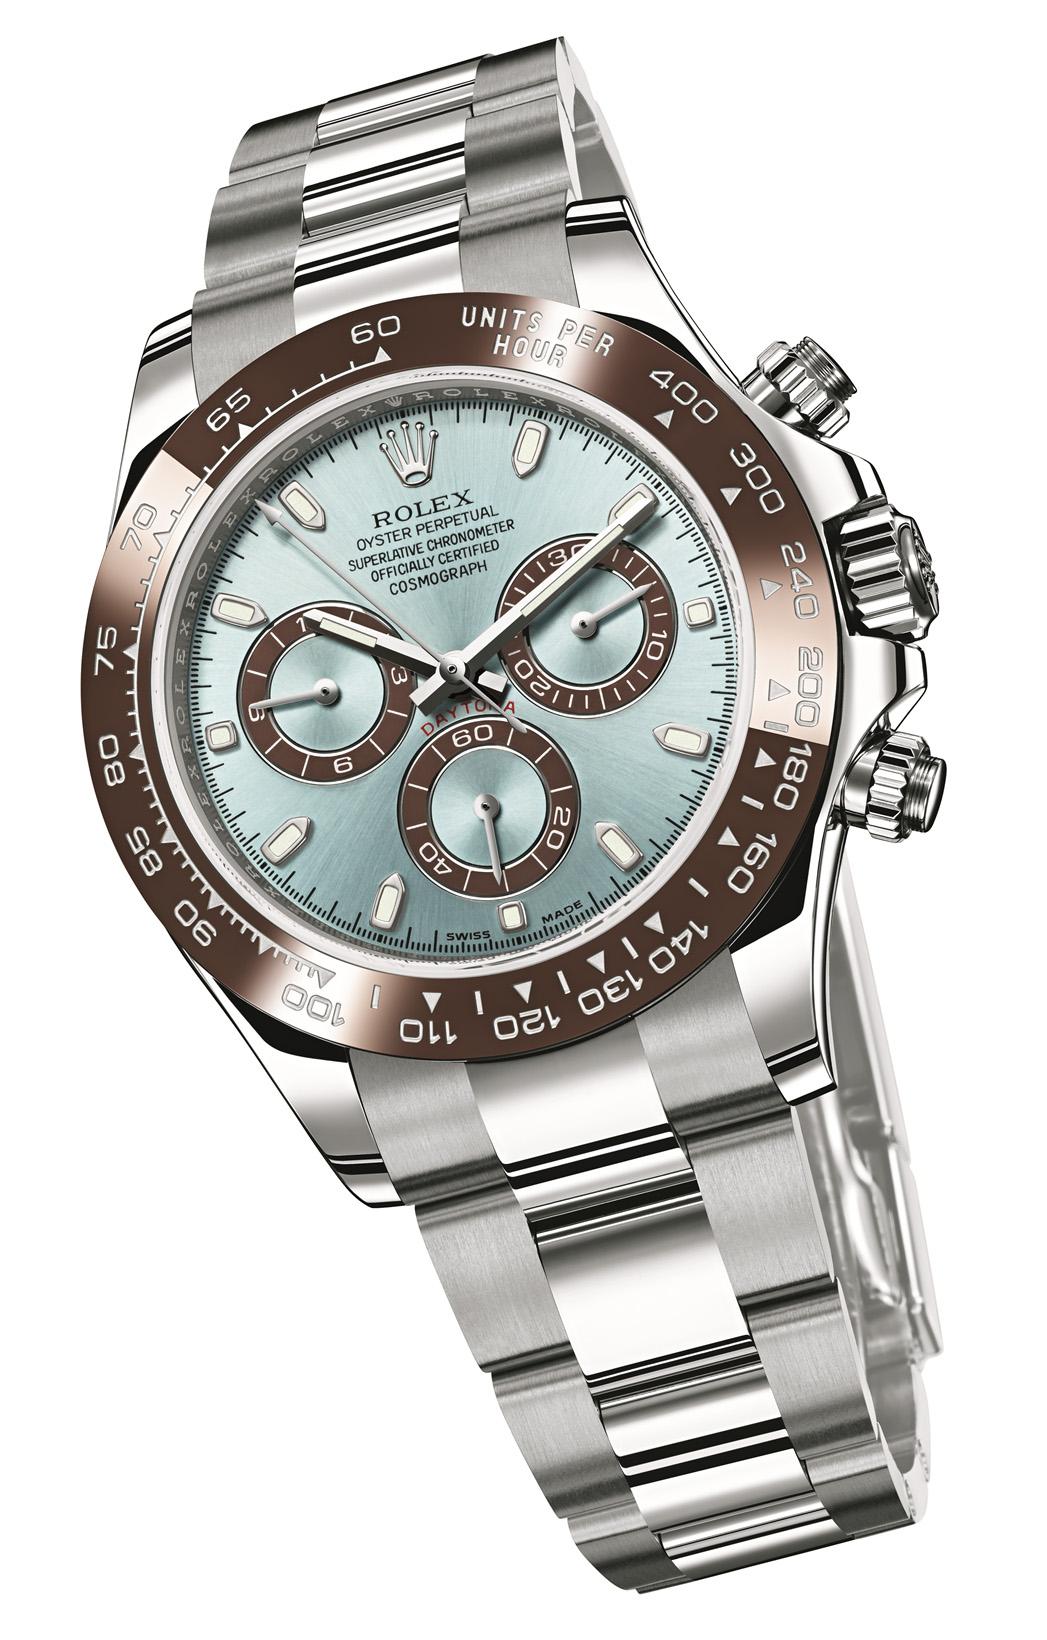 Rolex Cosmograph Daytona Ref. 116506 replica watch